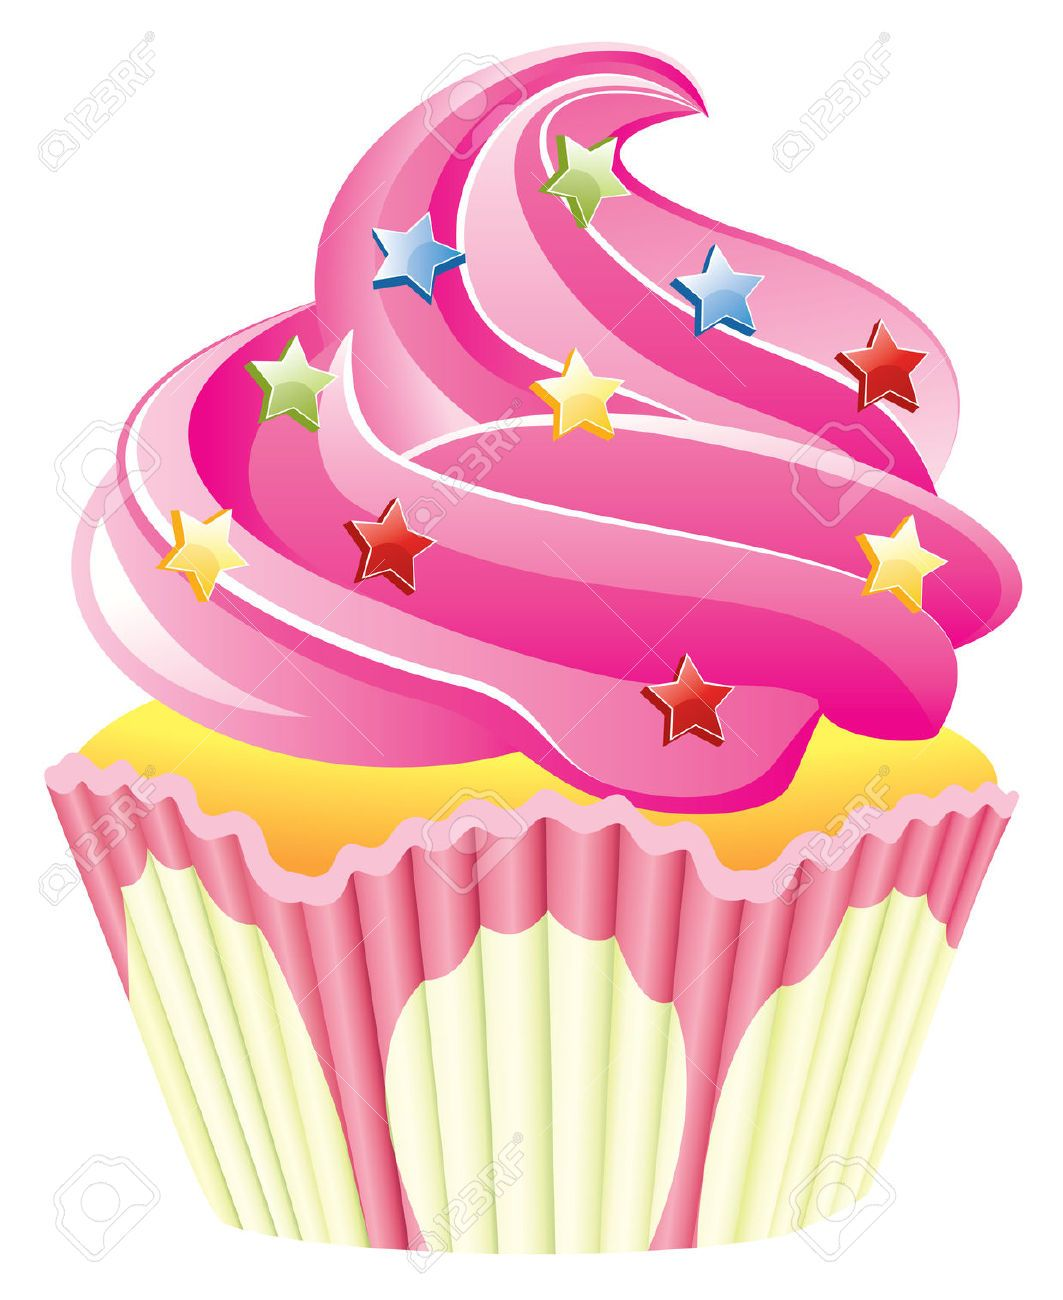 Clipart De Cupcake : Cute Cupcake Clip Art pink cupcake , pink cupcake with ...